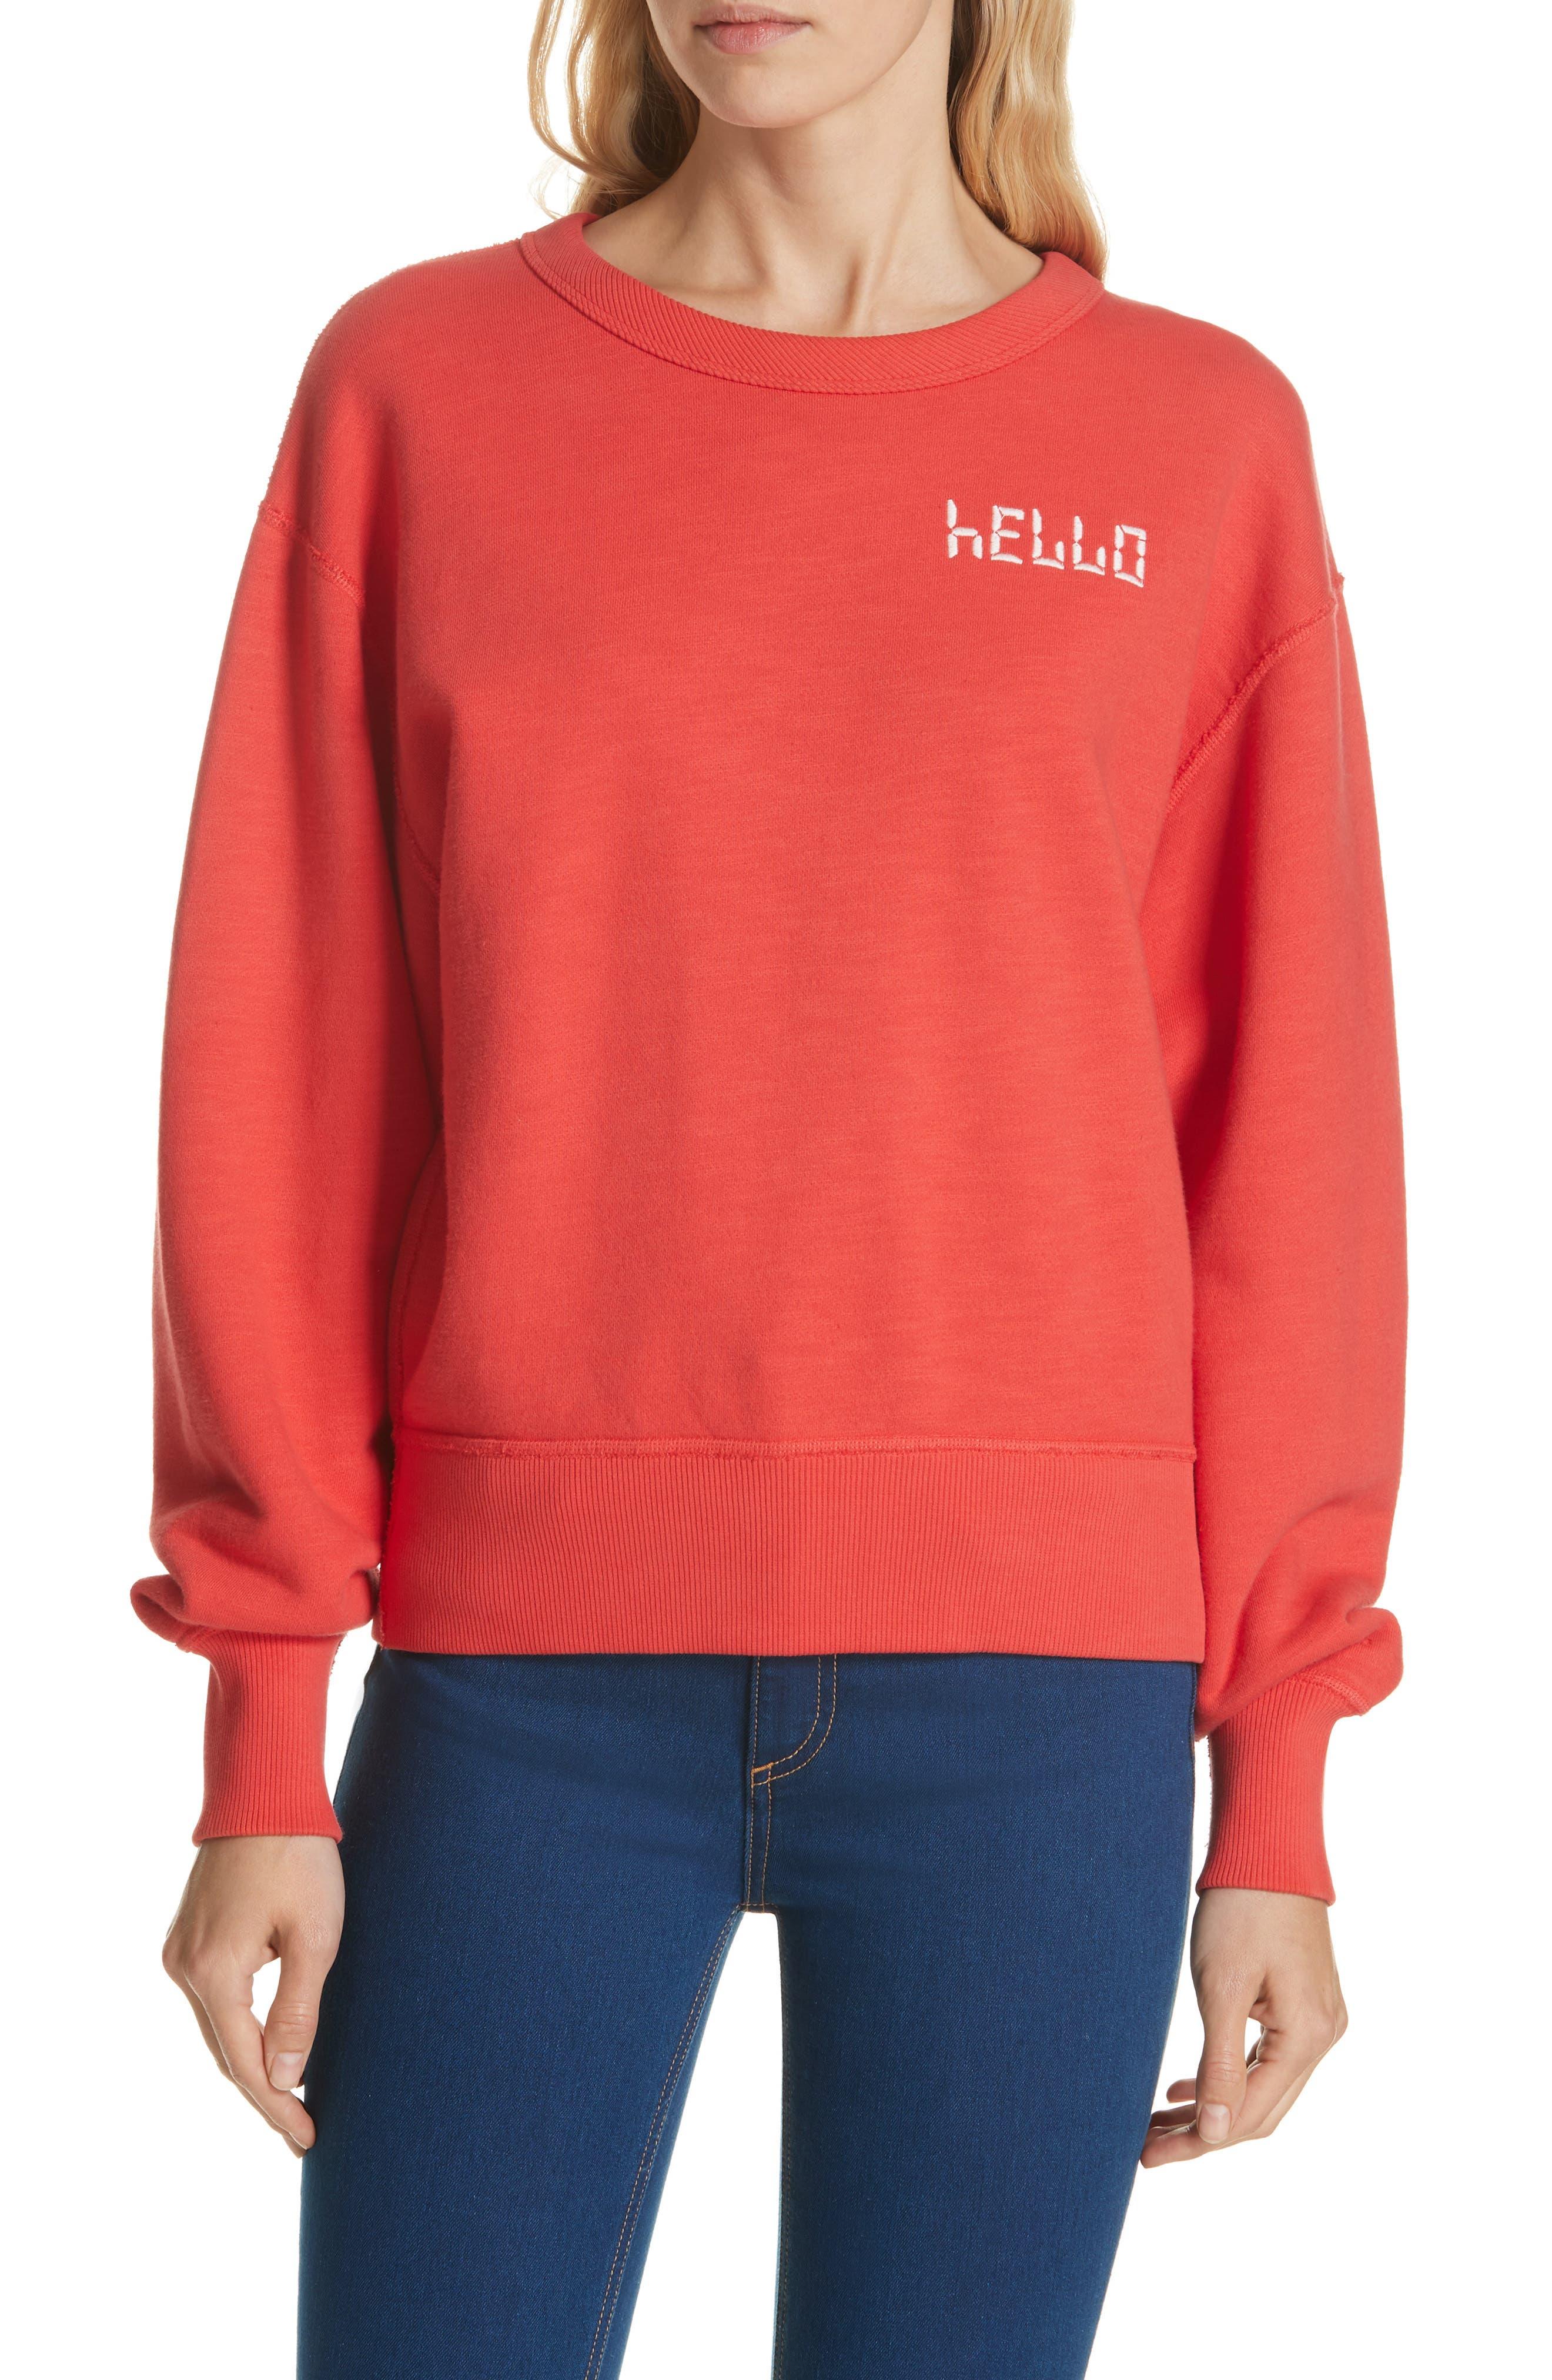 rag & bone Hello Sweatshirt,                         Main,                         color, 950